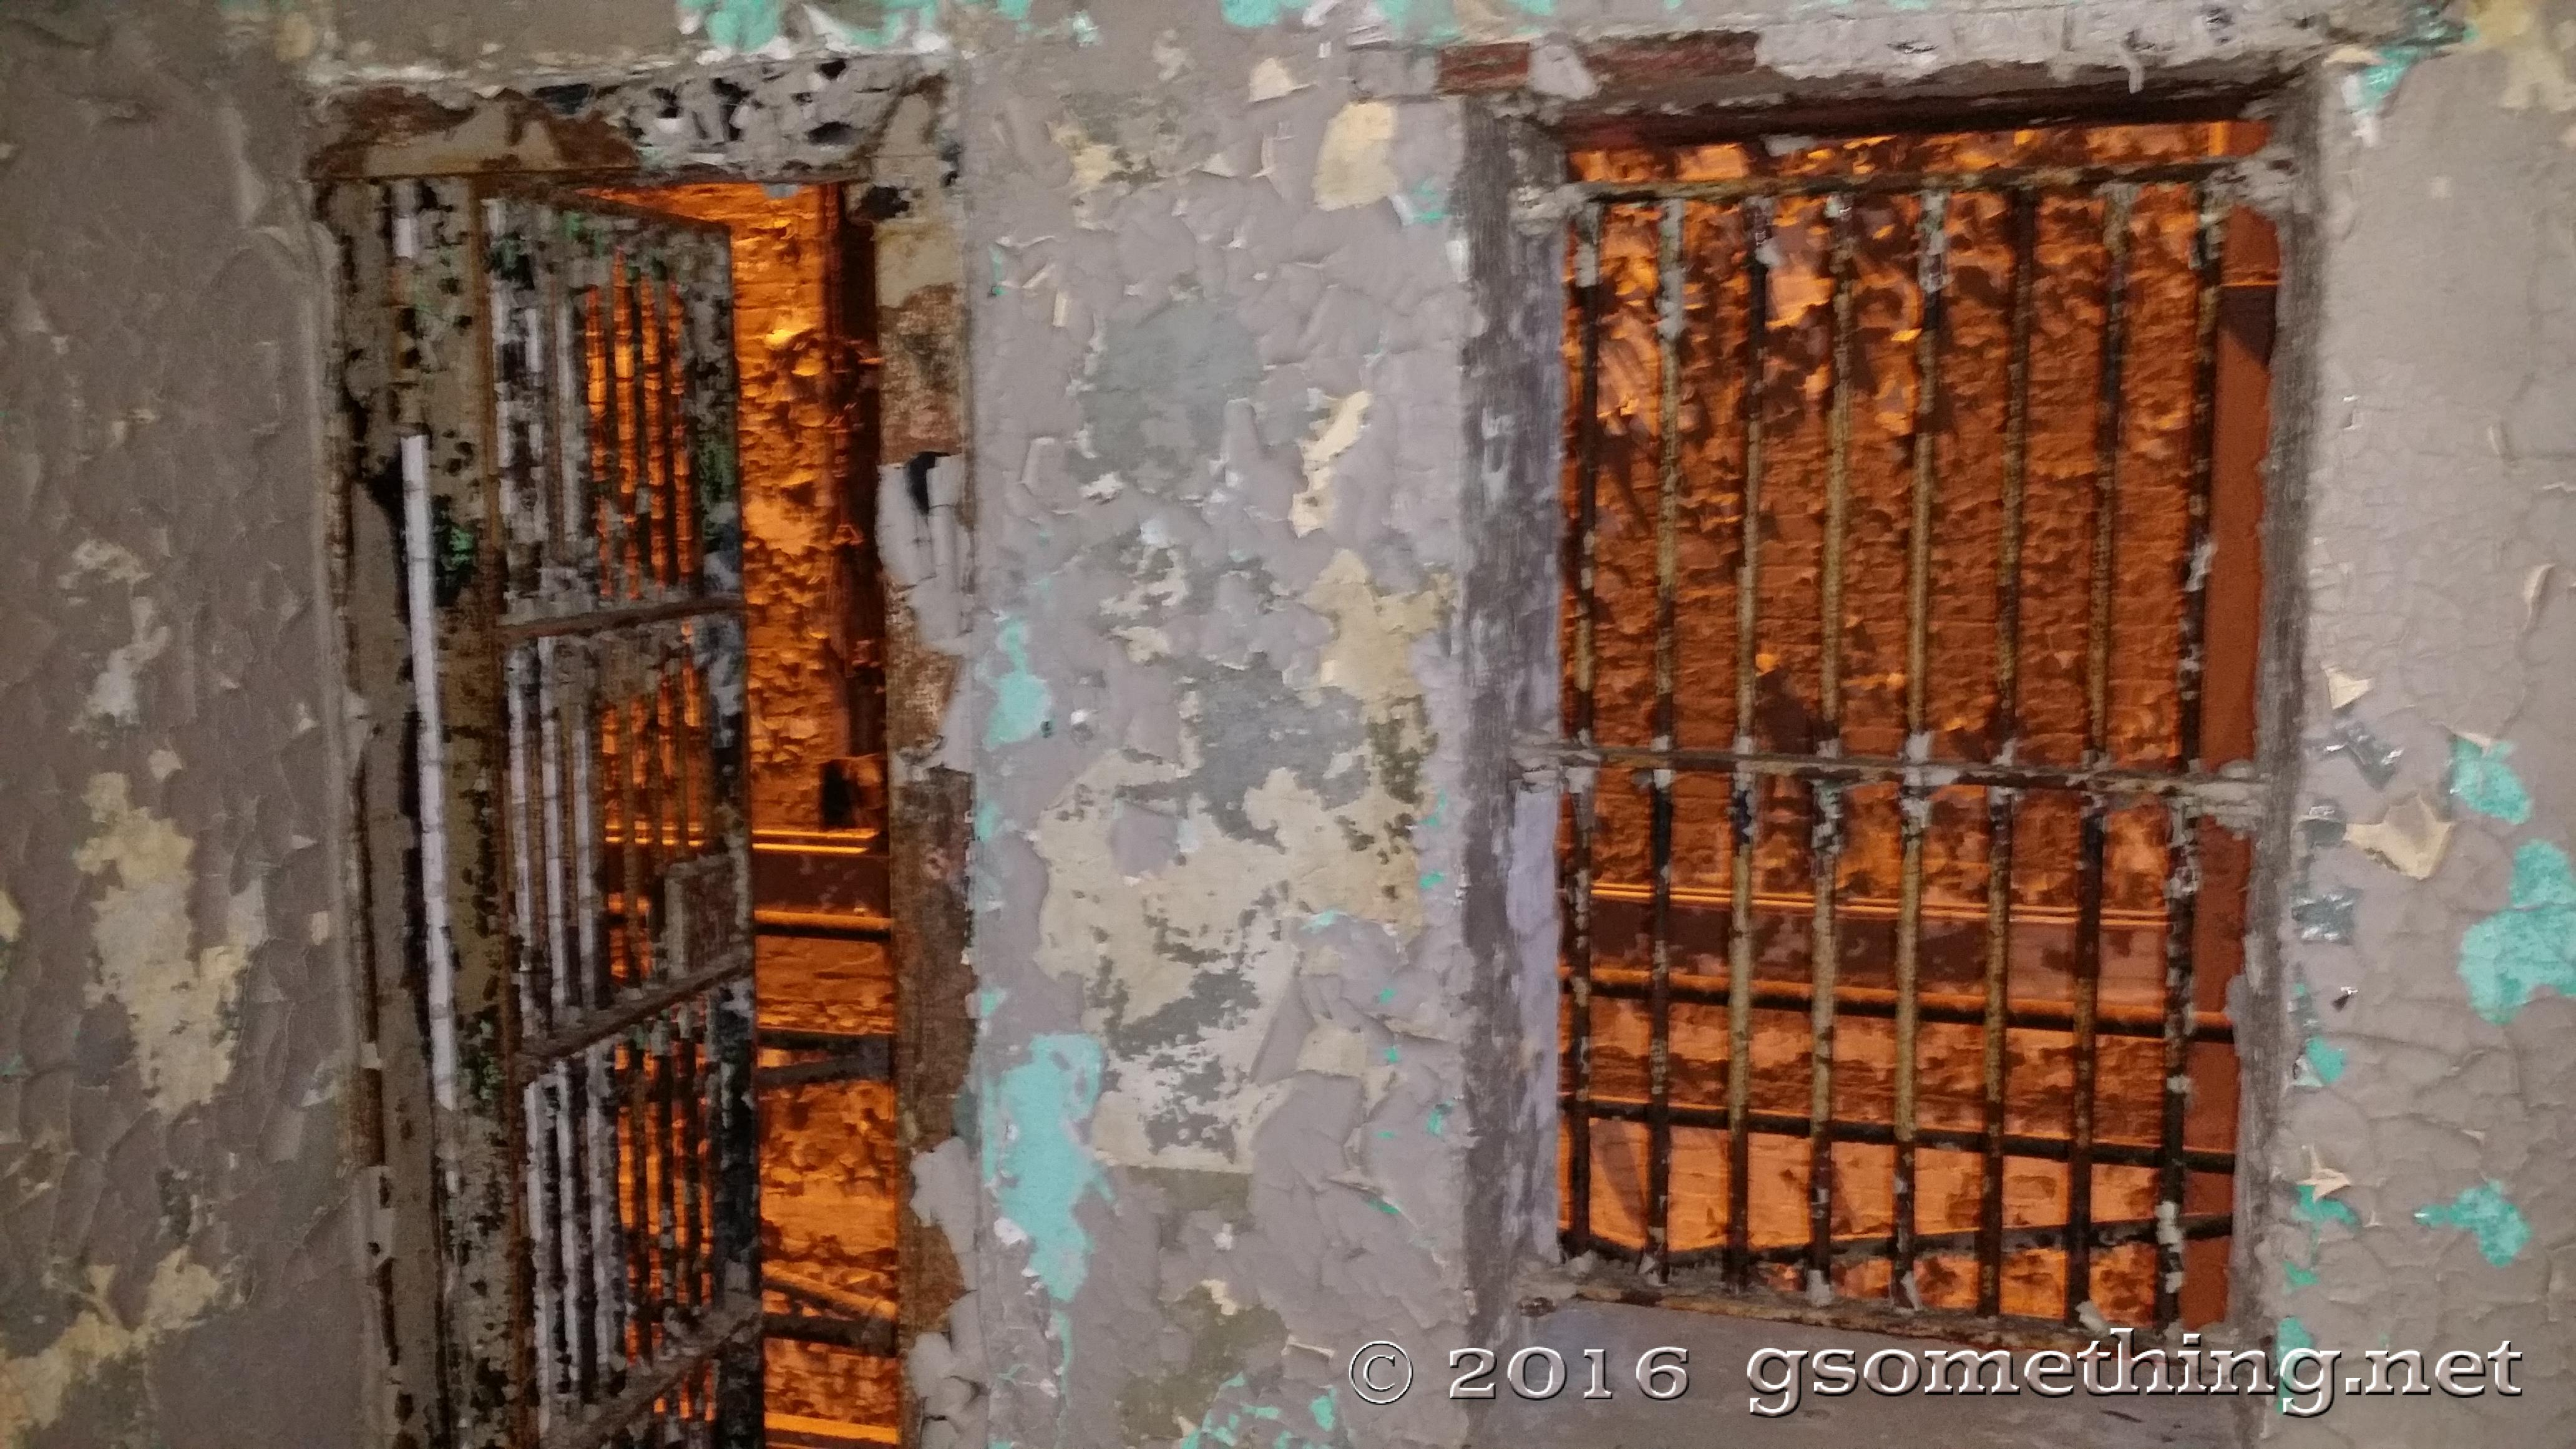 mansfield_reformatory_2nd_trip_47.jpg